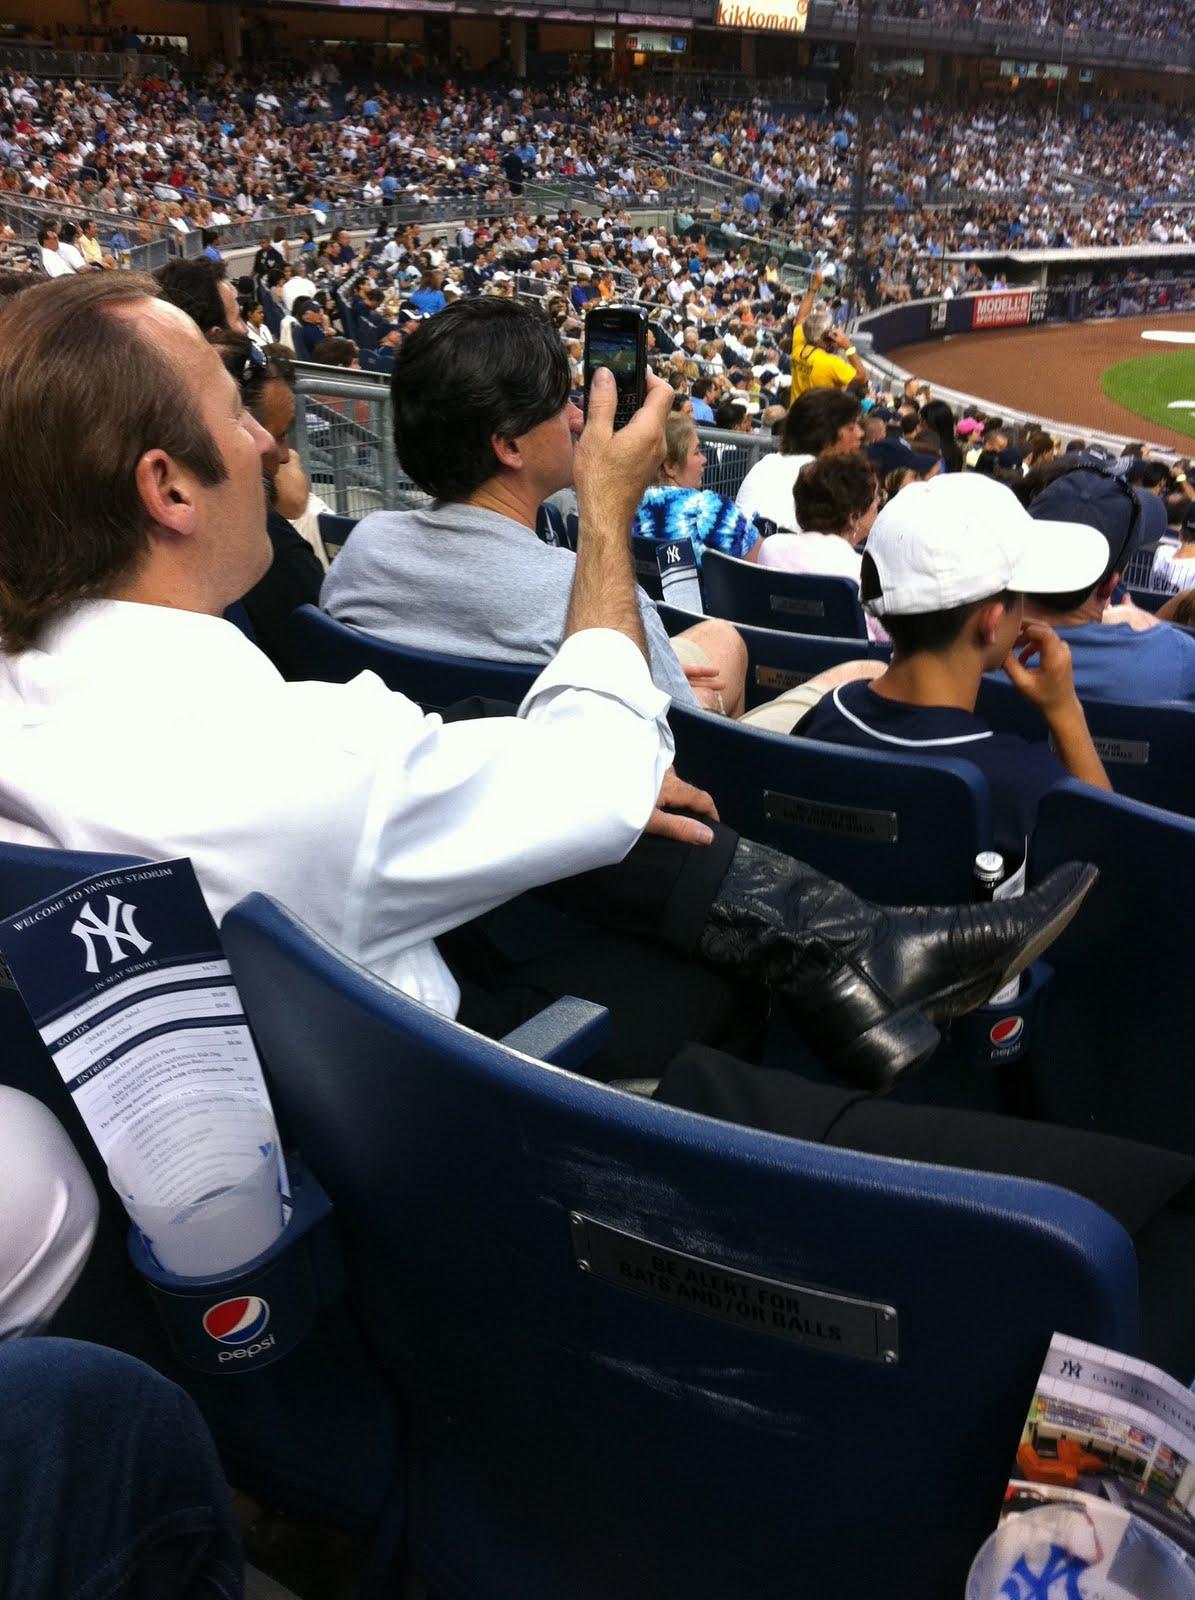 http://3.bp.blogspot.com/-qz5JiOFX3i0/TfK4AQaNANI/AAAAAAAAK2I/MjSm6oX6GCg/s1600/Seinfeld.jpg